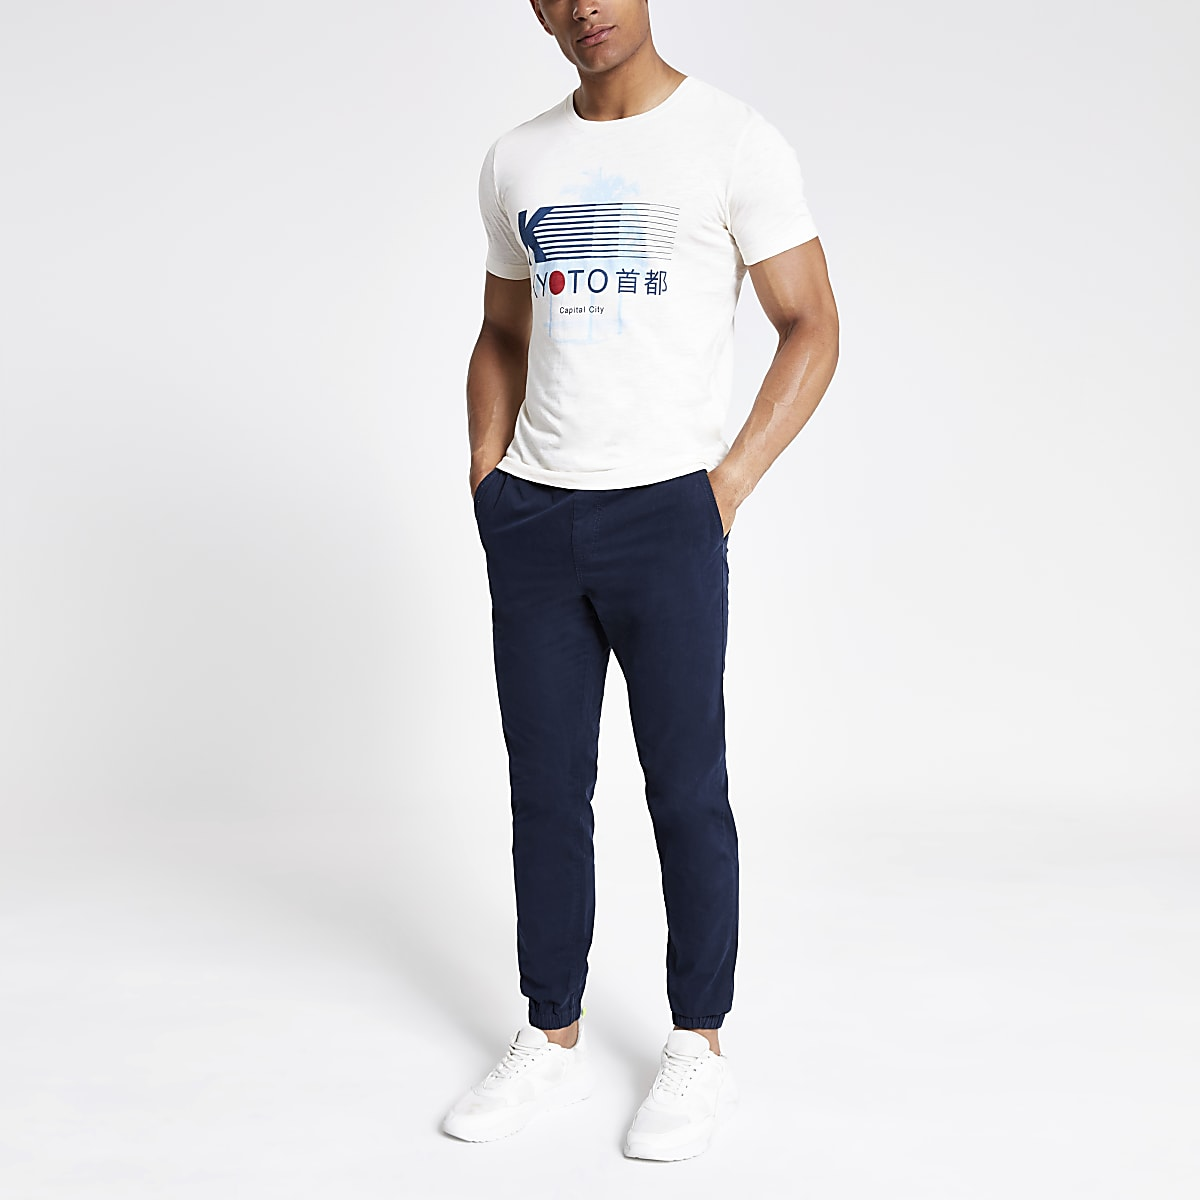 Selected Homme - Wit T-shirt met print